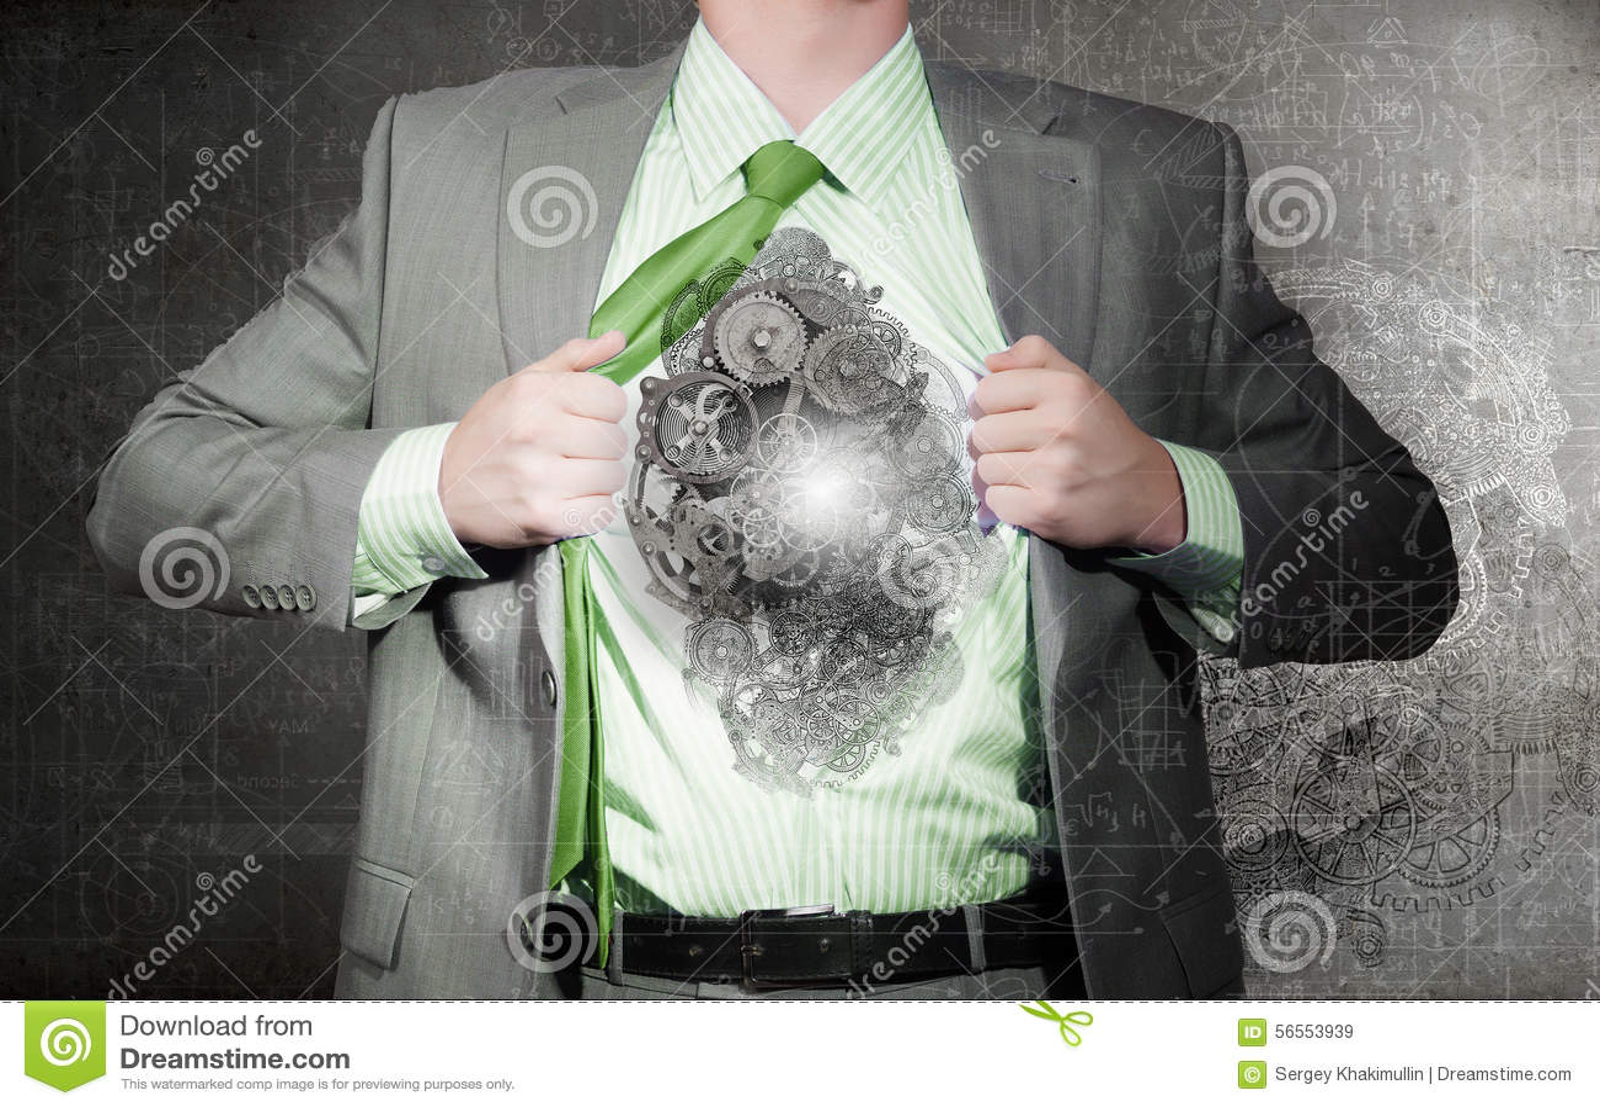 Download Επιχειρηματίας και ιδέα στοκ εικόνα. εικόνα από υπάλληλος - 56553939